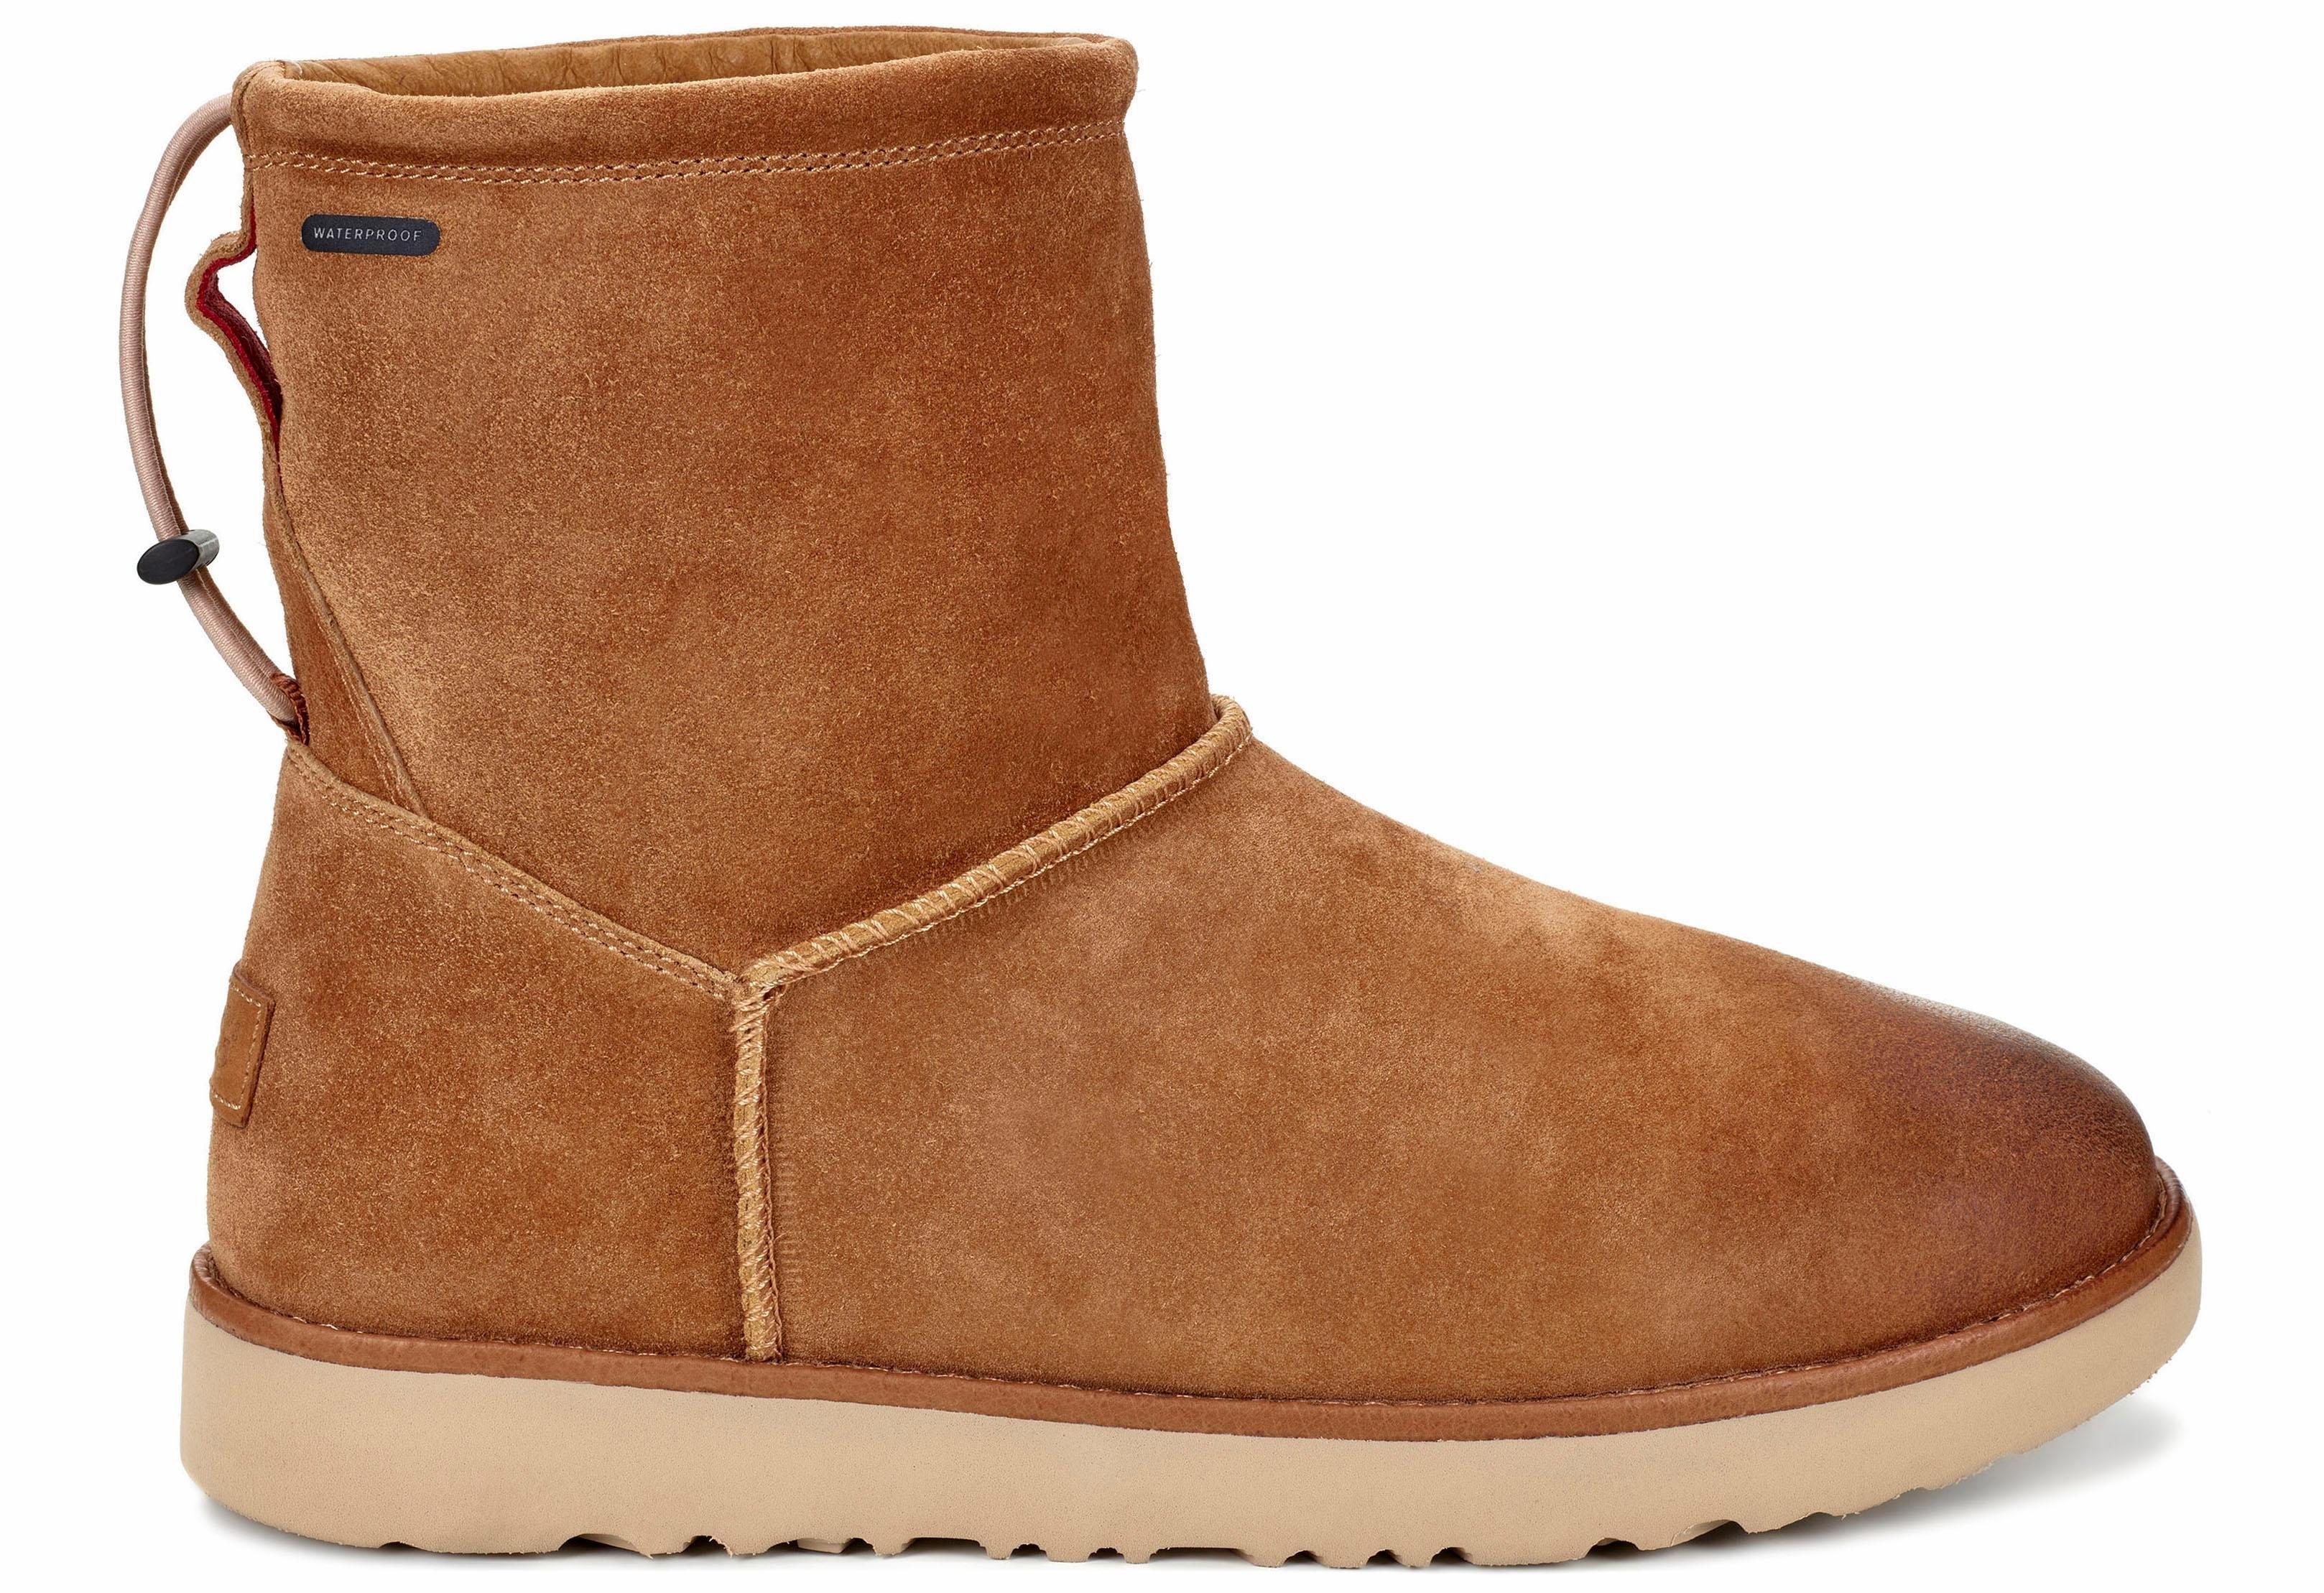 Je Waterproof Bij Zonder Vind Sluitingclassic Ugg Boots Toggle E29DIH